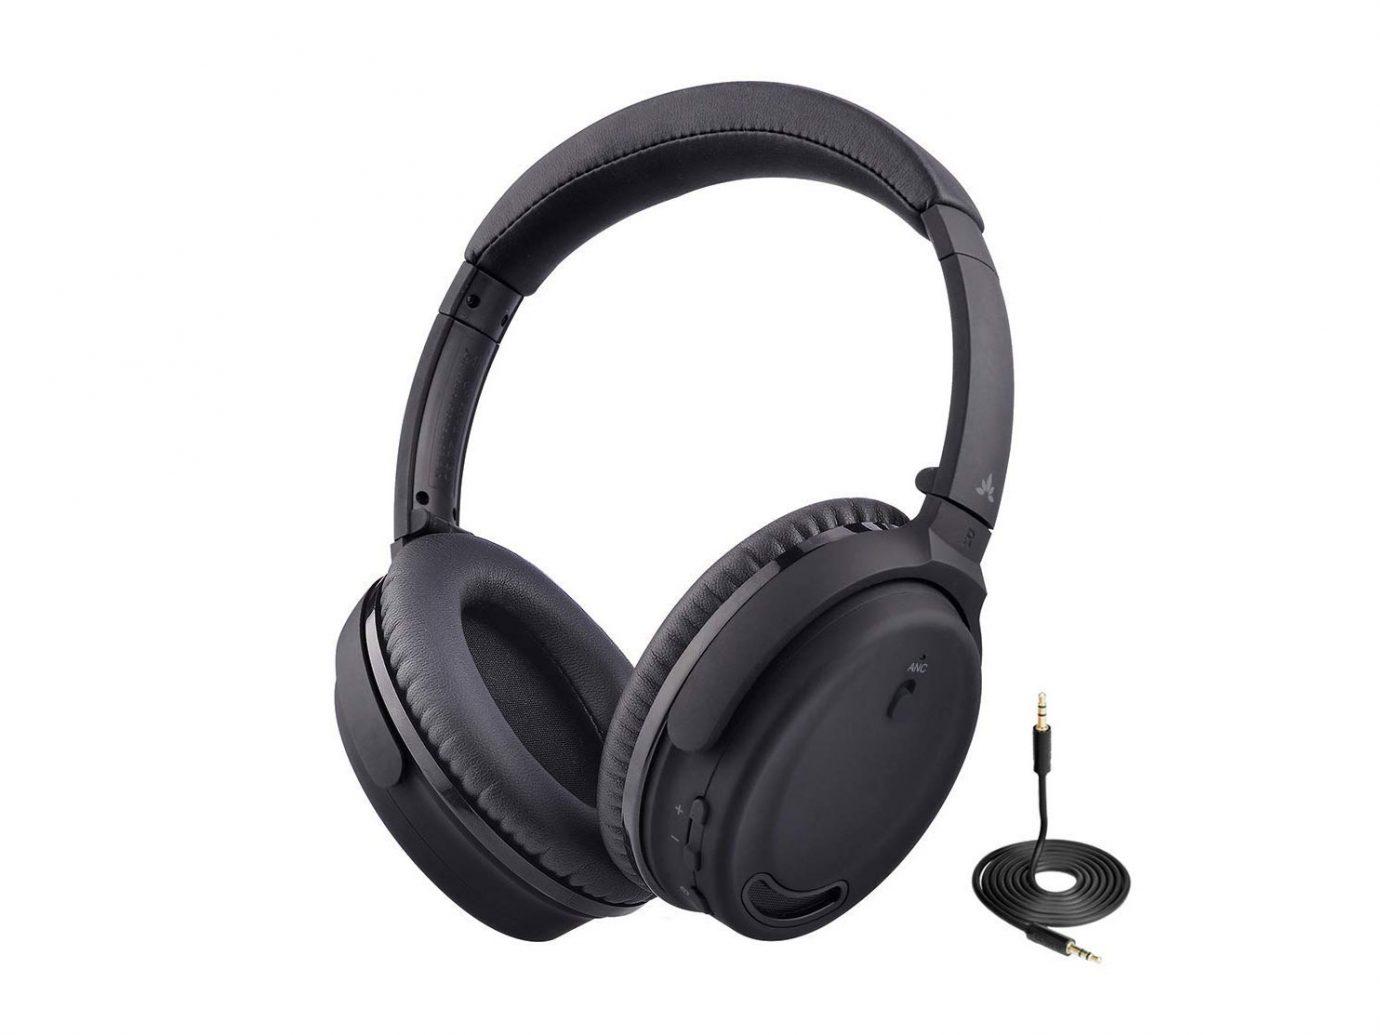 Avantree ANC032 Active Noise Canceling Bluetooth Headphones